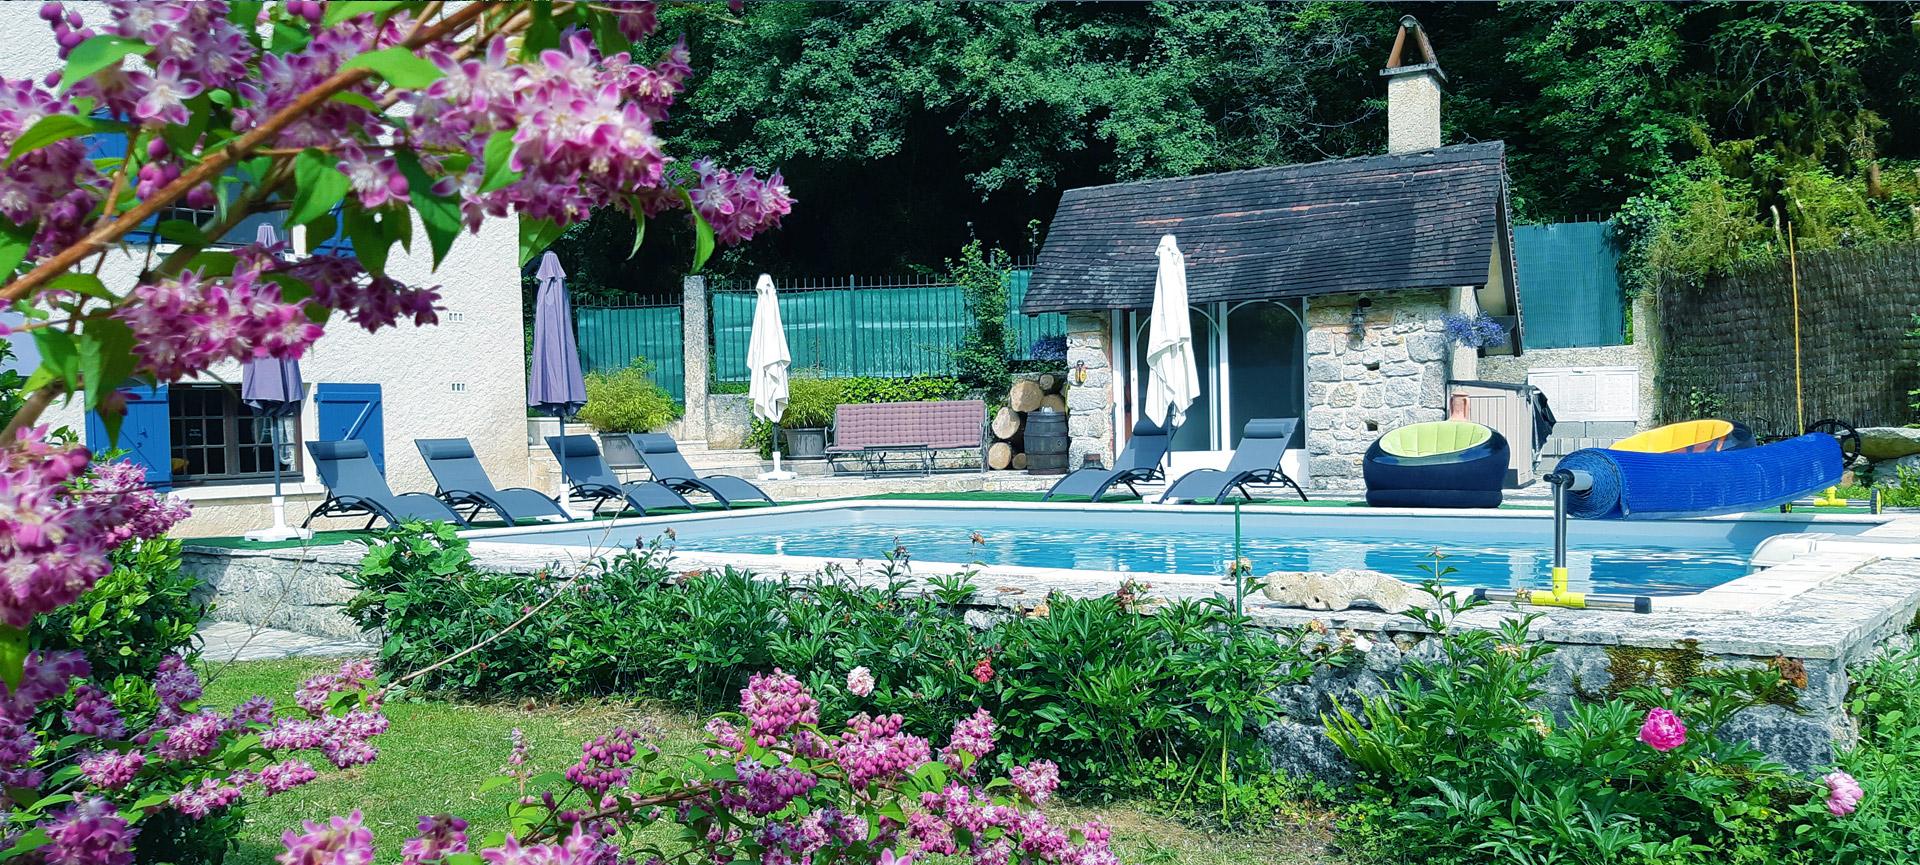 swimming pool cottages gites de france 46 figeac